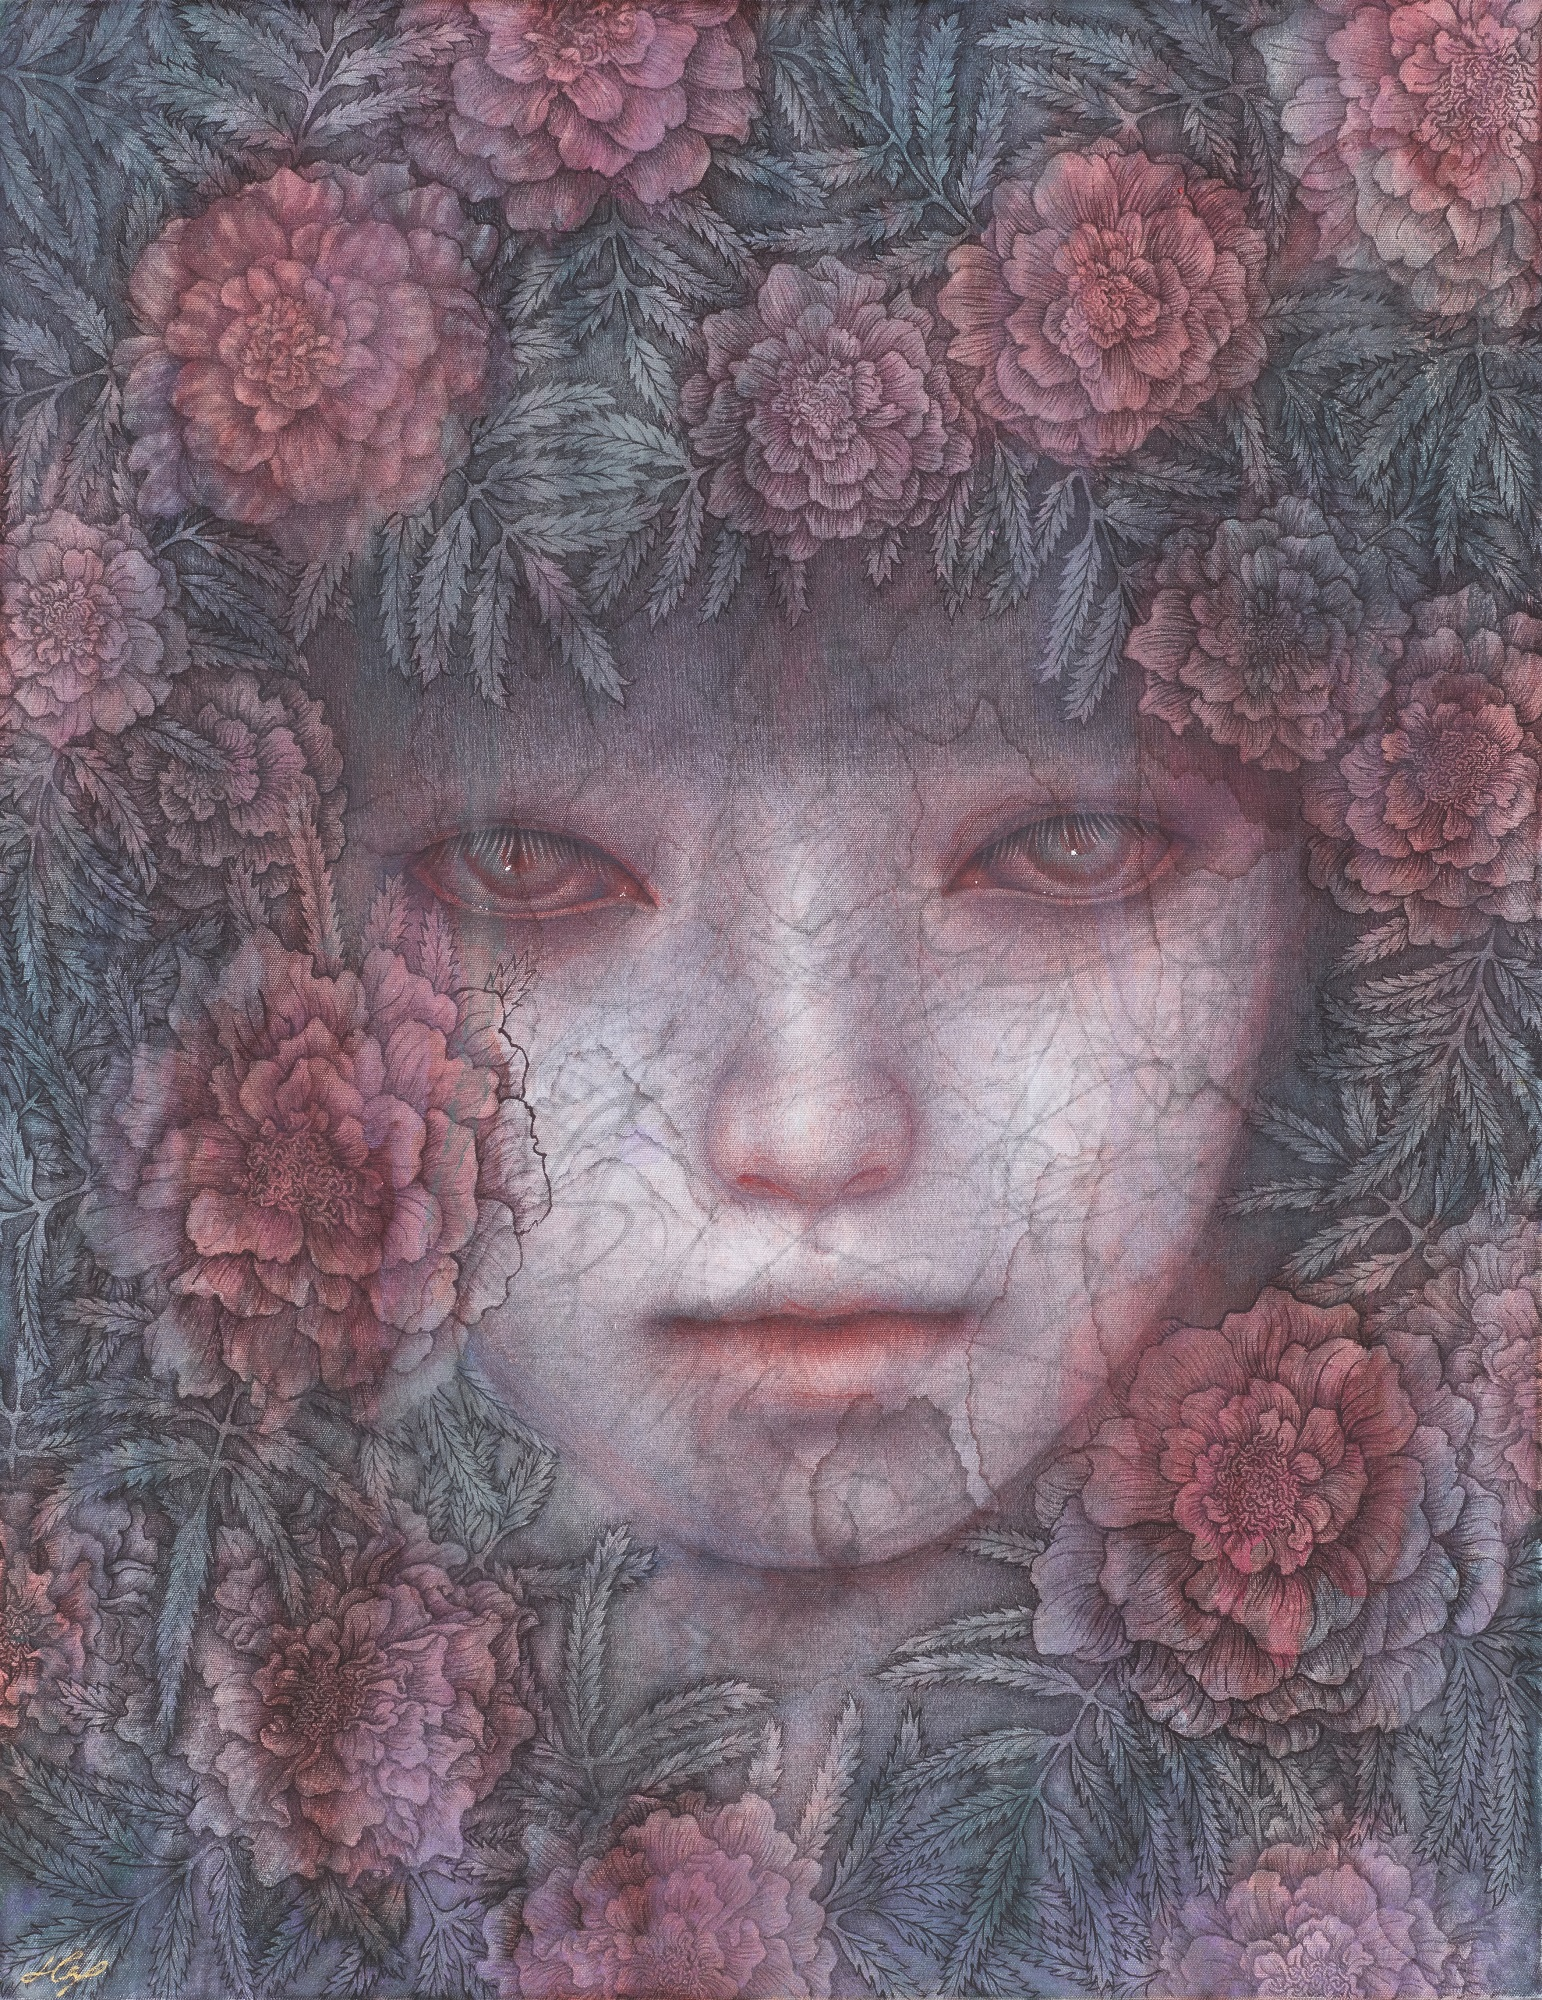 Atsuko Goto, Marigold, F6(41.0 × 31.8 cm)